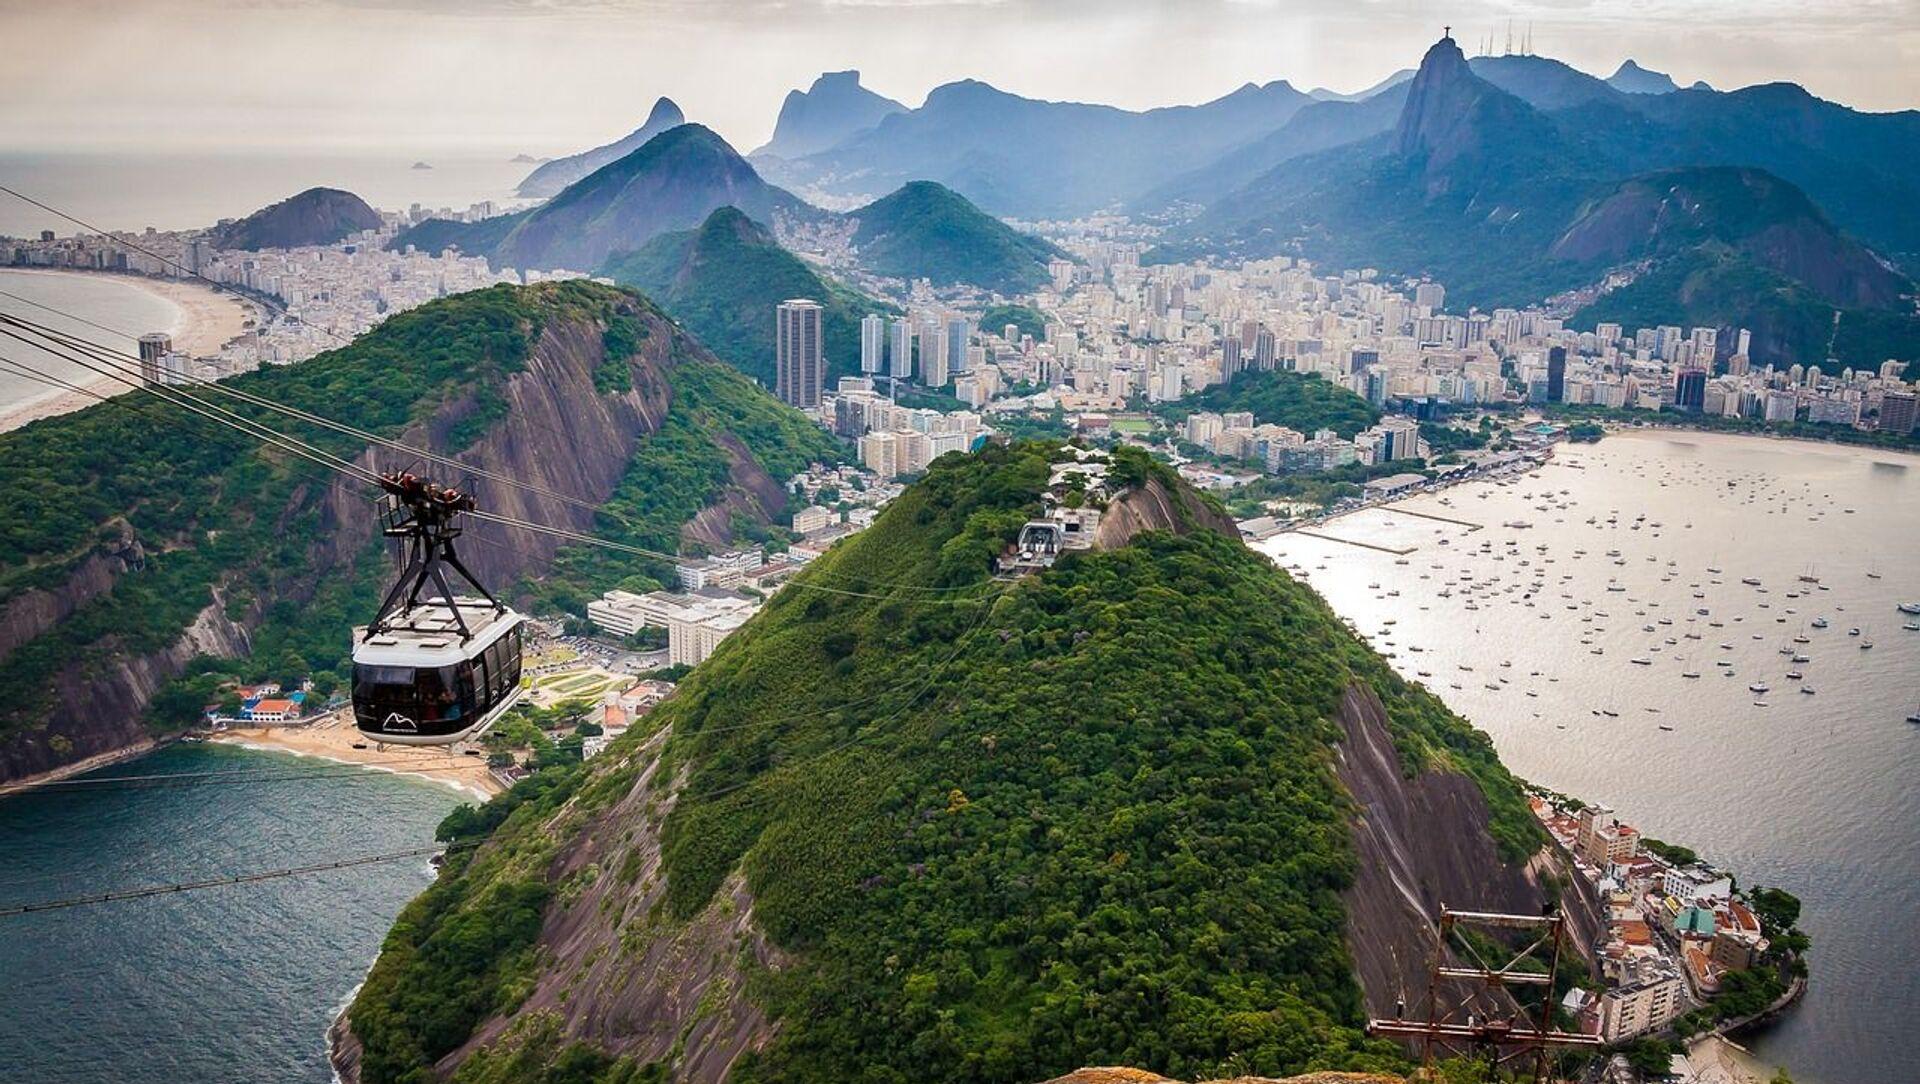 Brésil  - Sputnik France, 1920, 30.07.2021